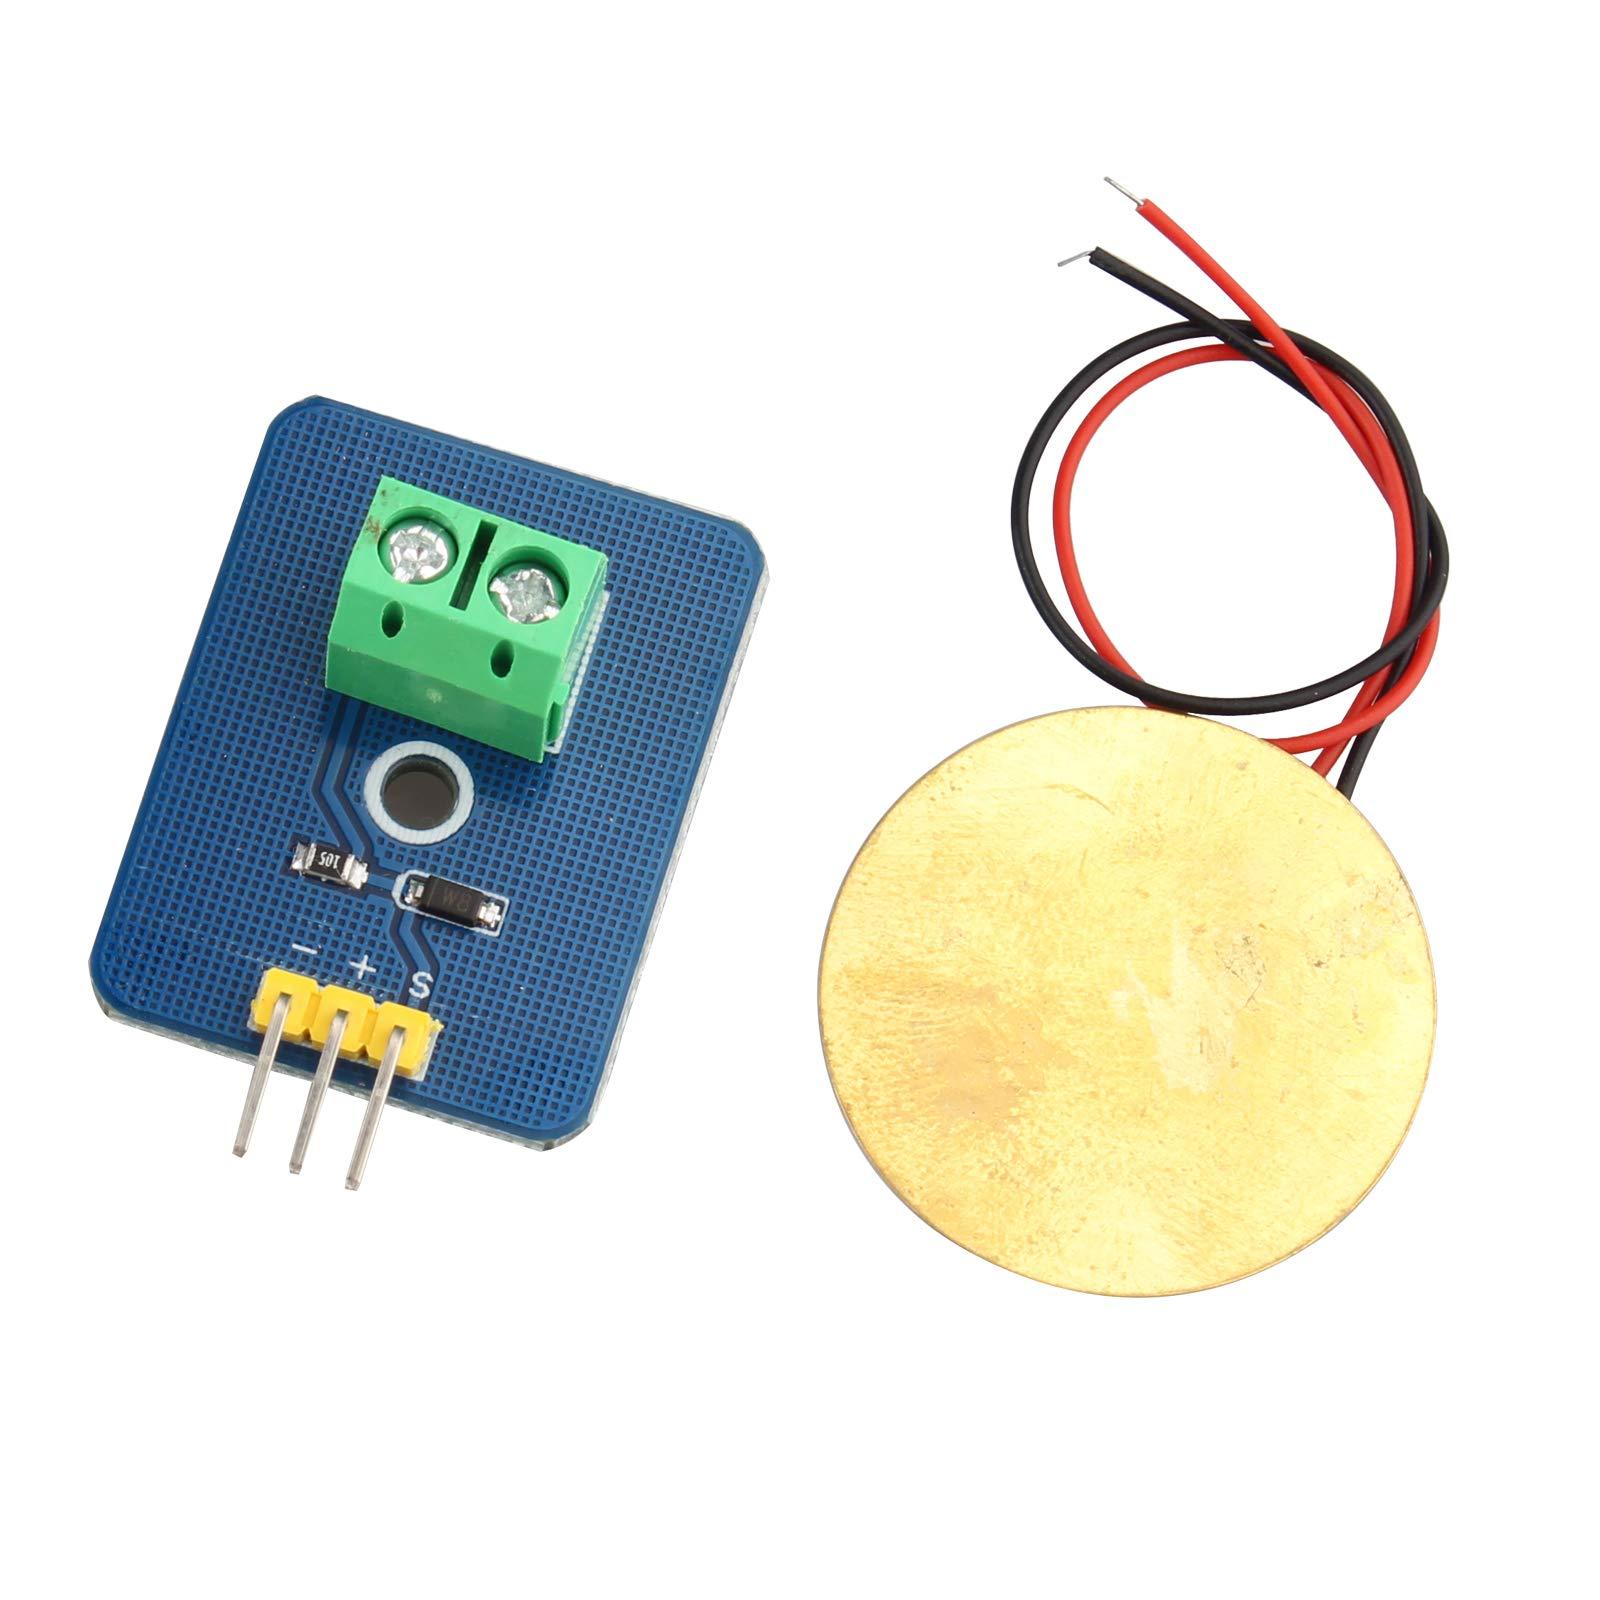 Analog Piezoelectricity Ceramic Piezo Vibration Sensor DIY F Arduino UNO Rev3